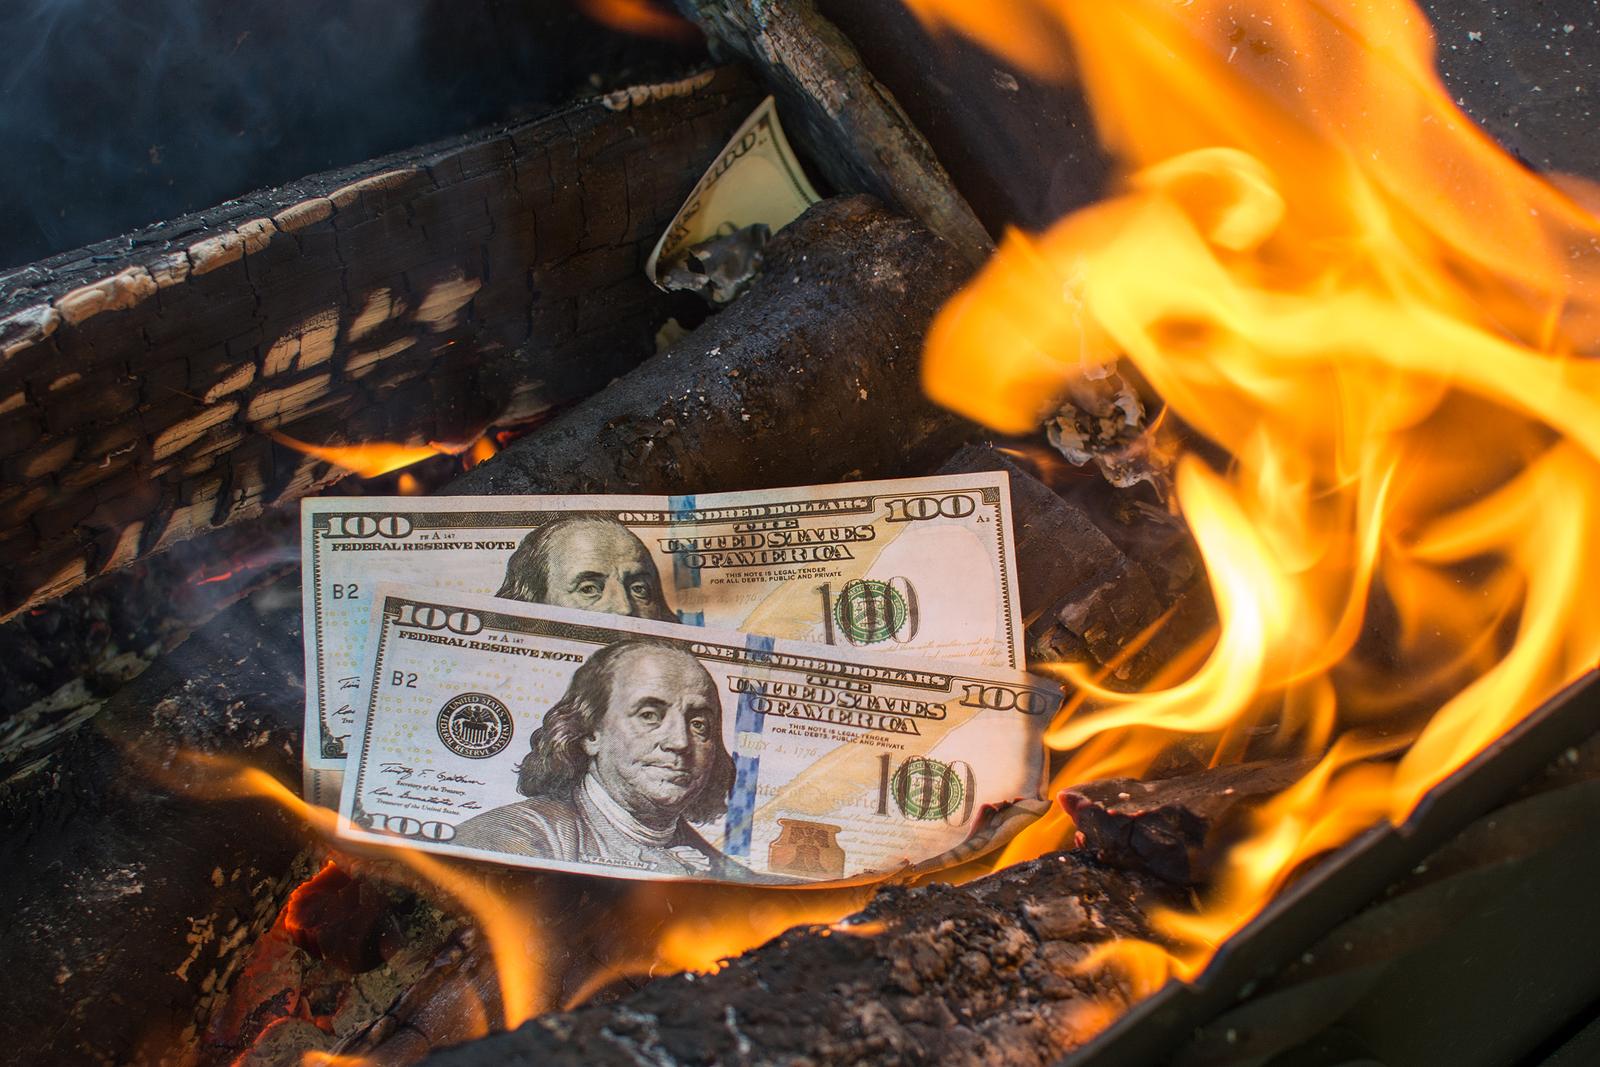 Why an Average Startup Burns Through So Much Cash